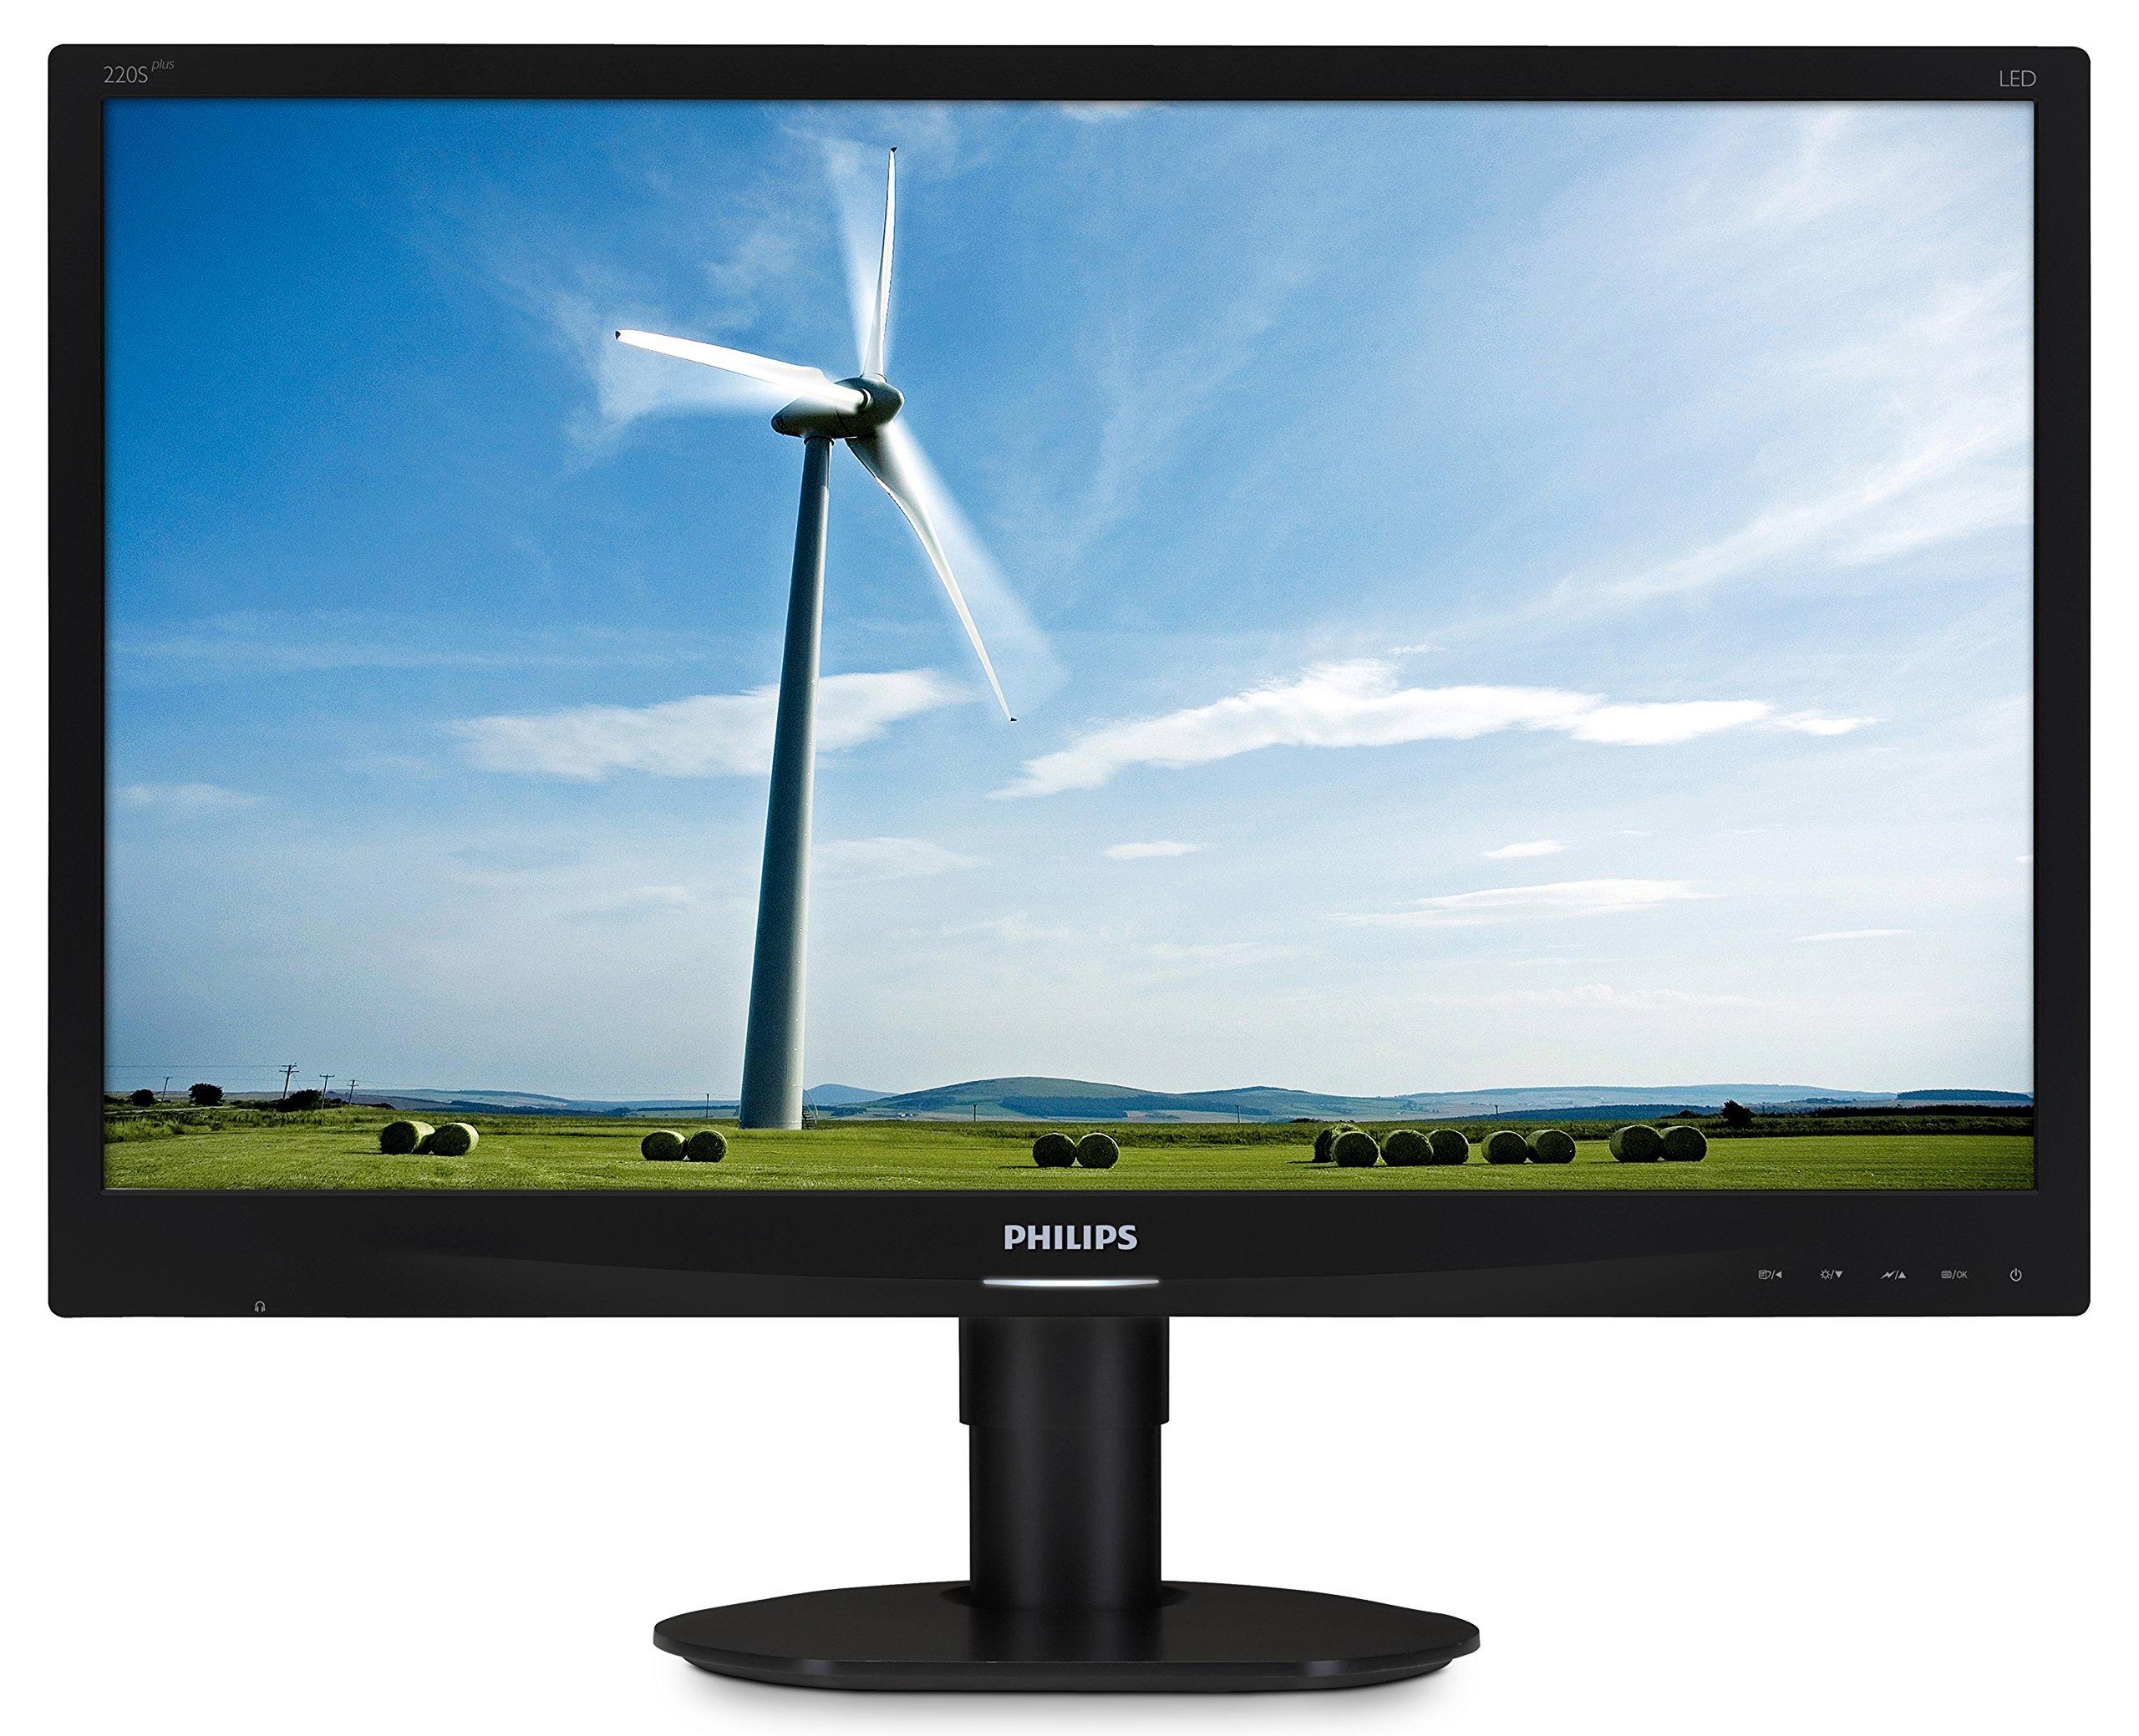 Philips 220S4LS LCD Monitor 22